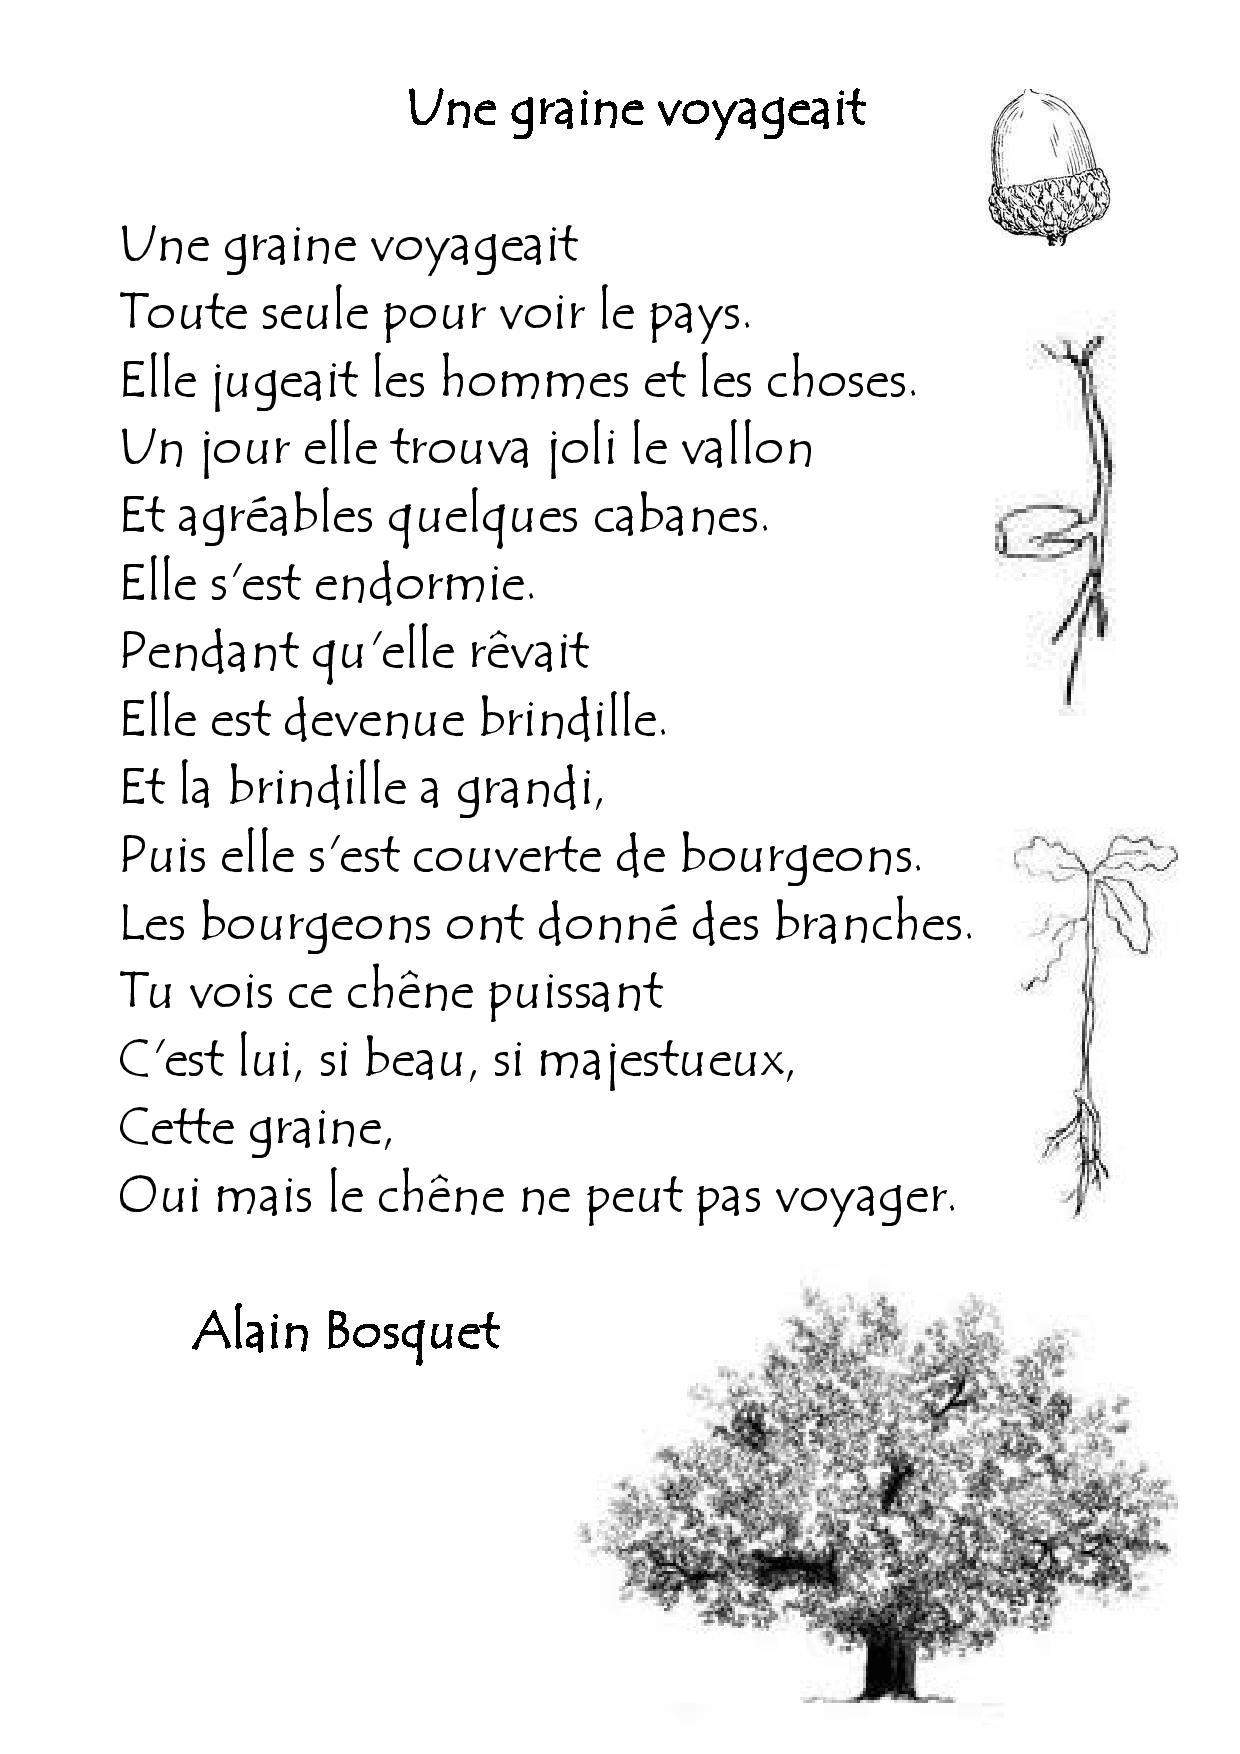 poesie une graine qui voyageait